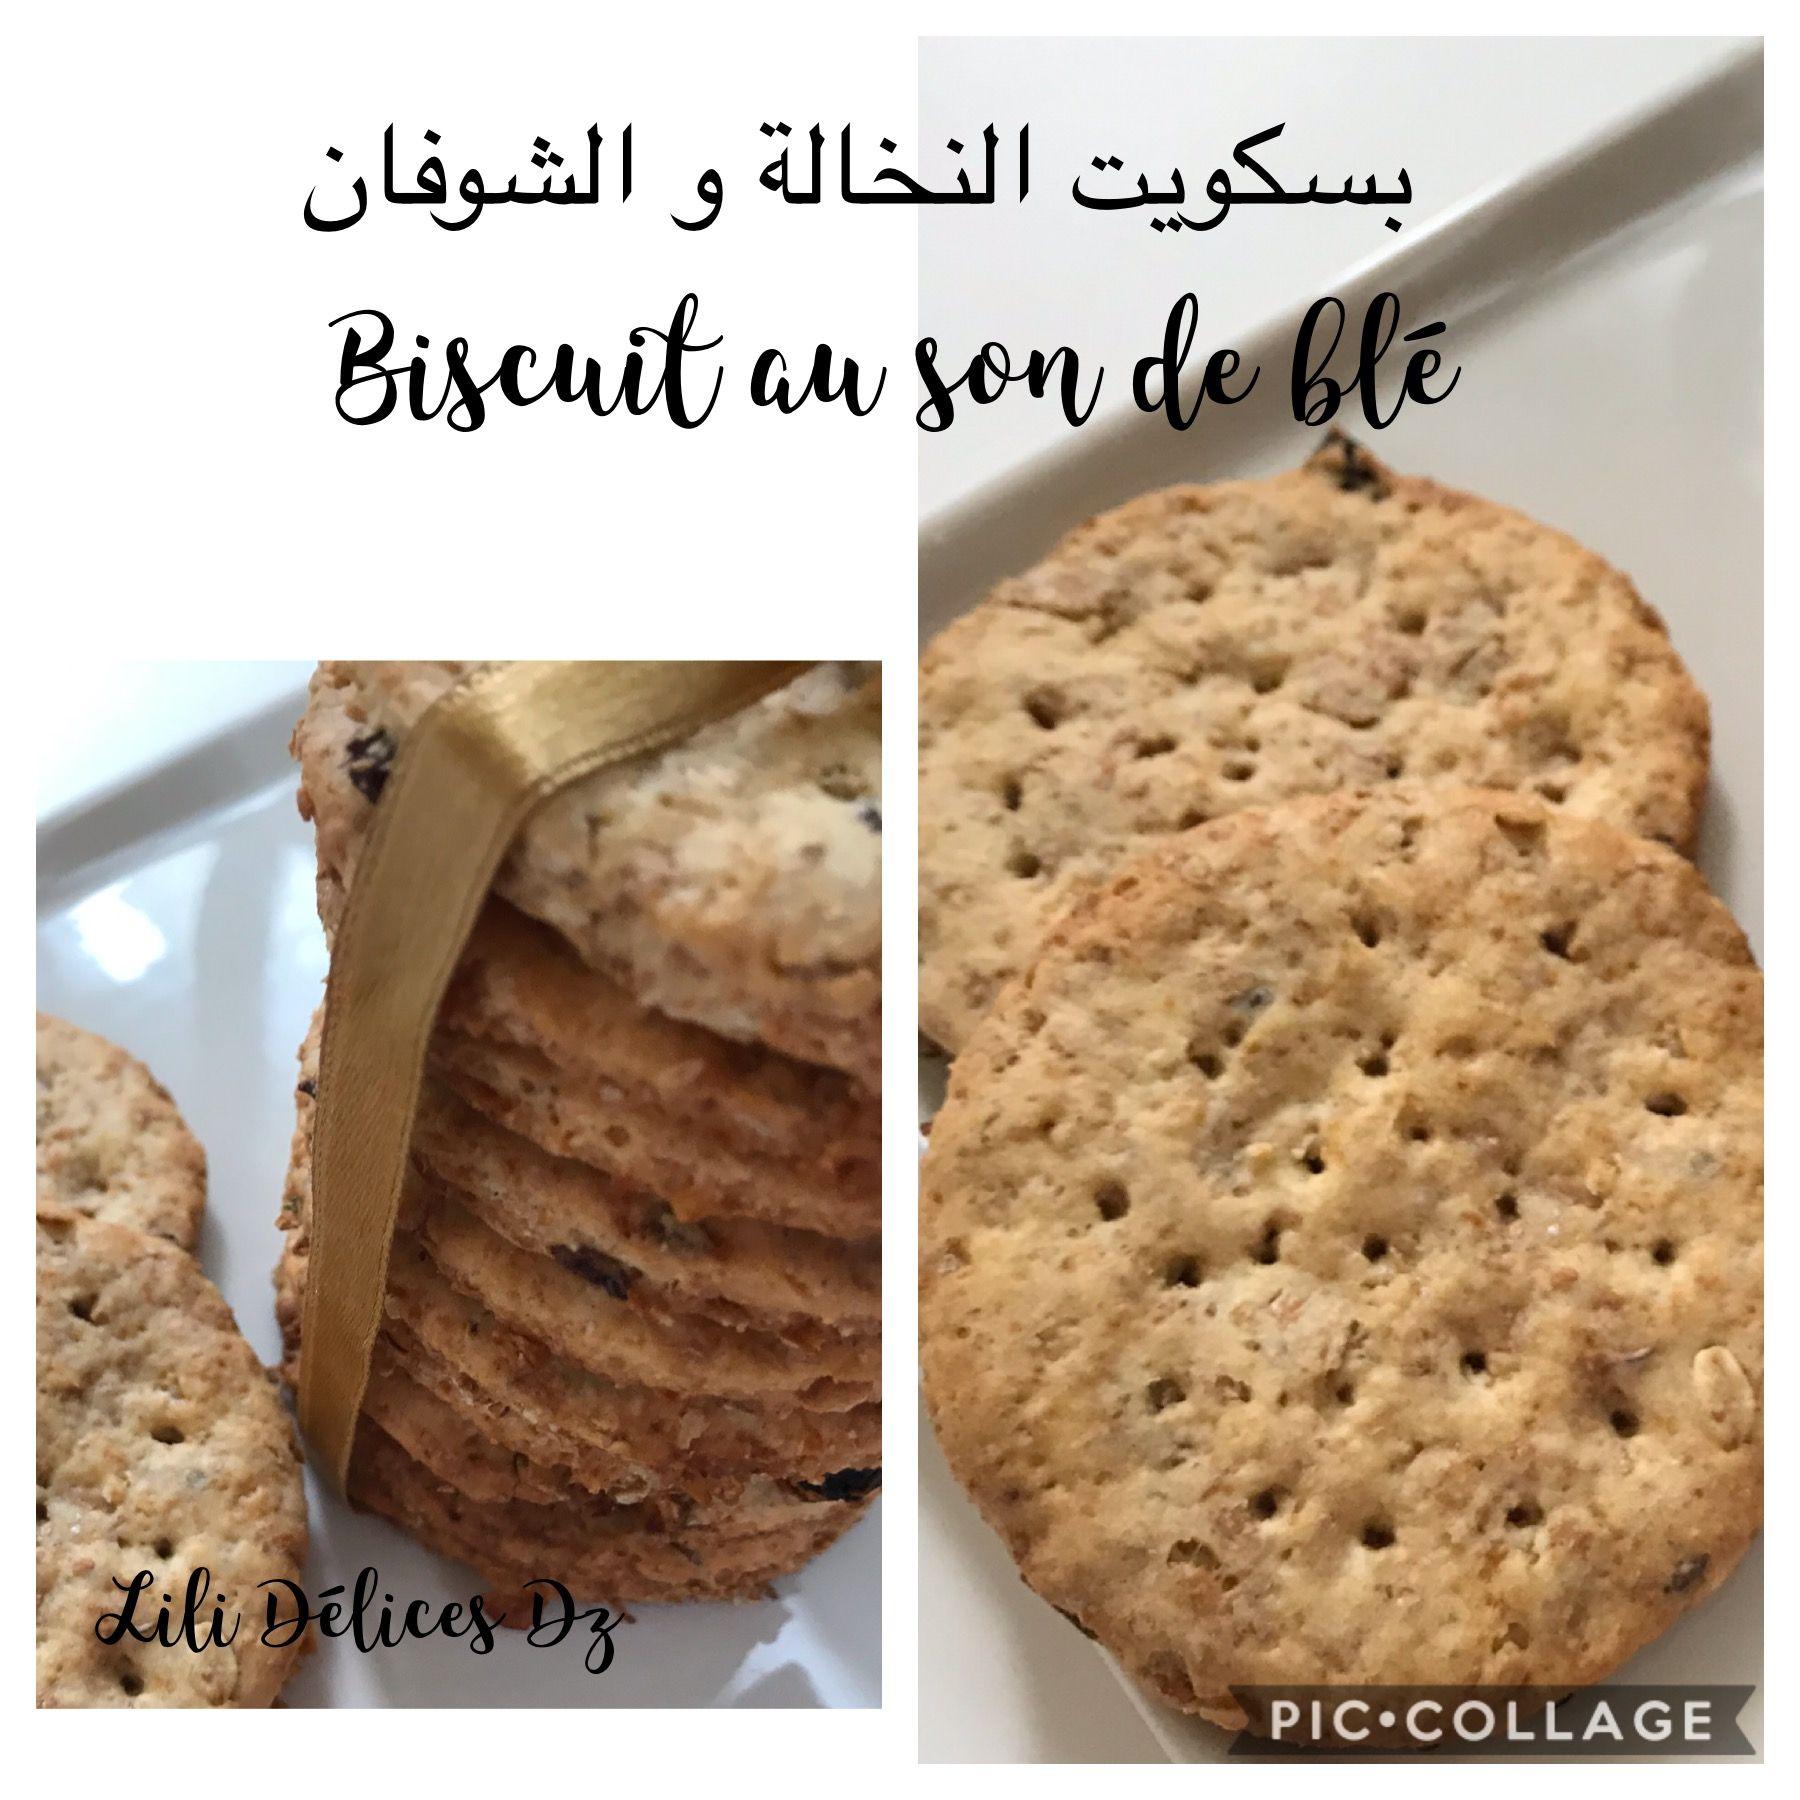 Biscuit Digestive Au Son De Ble صابلي النخالة و الشوفان Youtube Food Biscuits Desserts